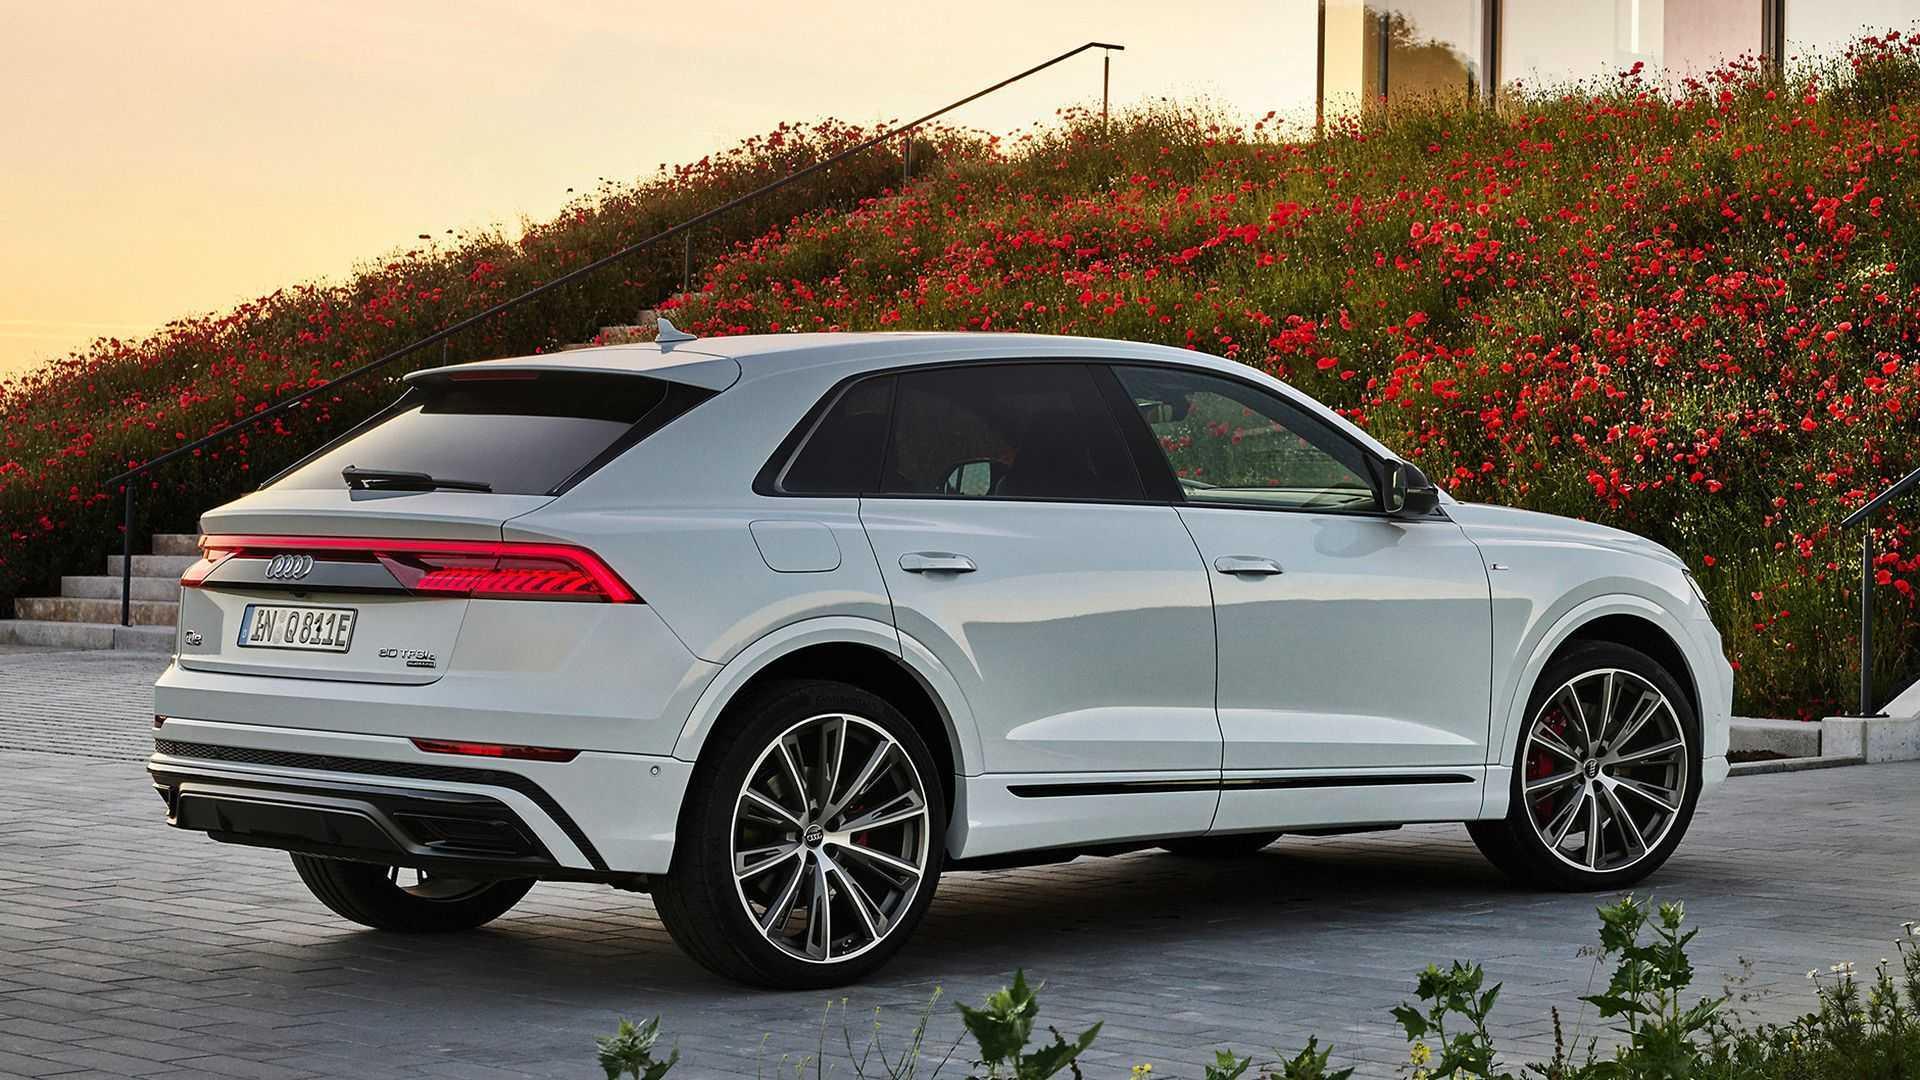 Audi Q8 TFSIe quattro: SUV híbrido plug-in de até 462 cv ...